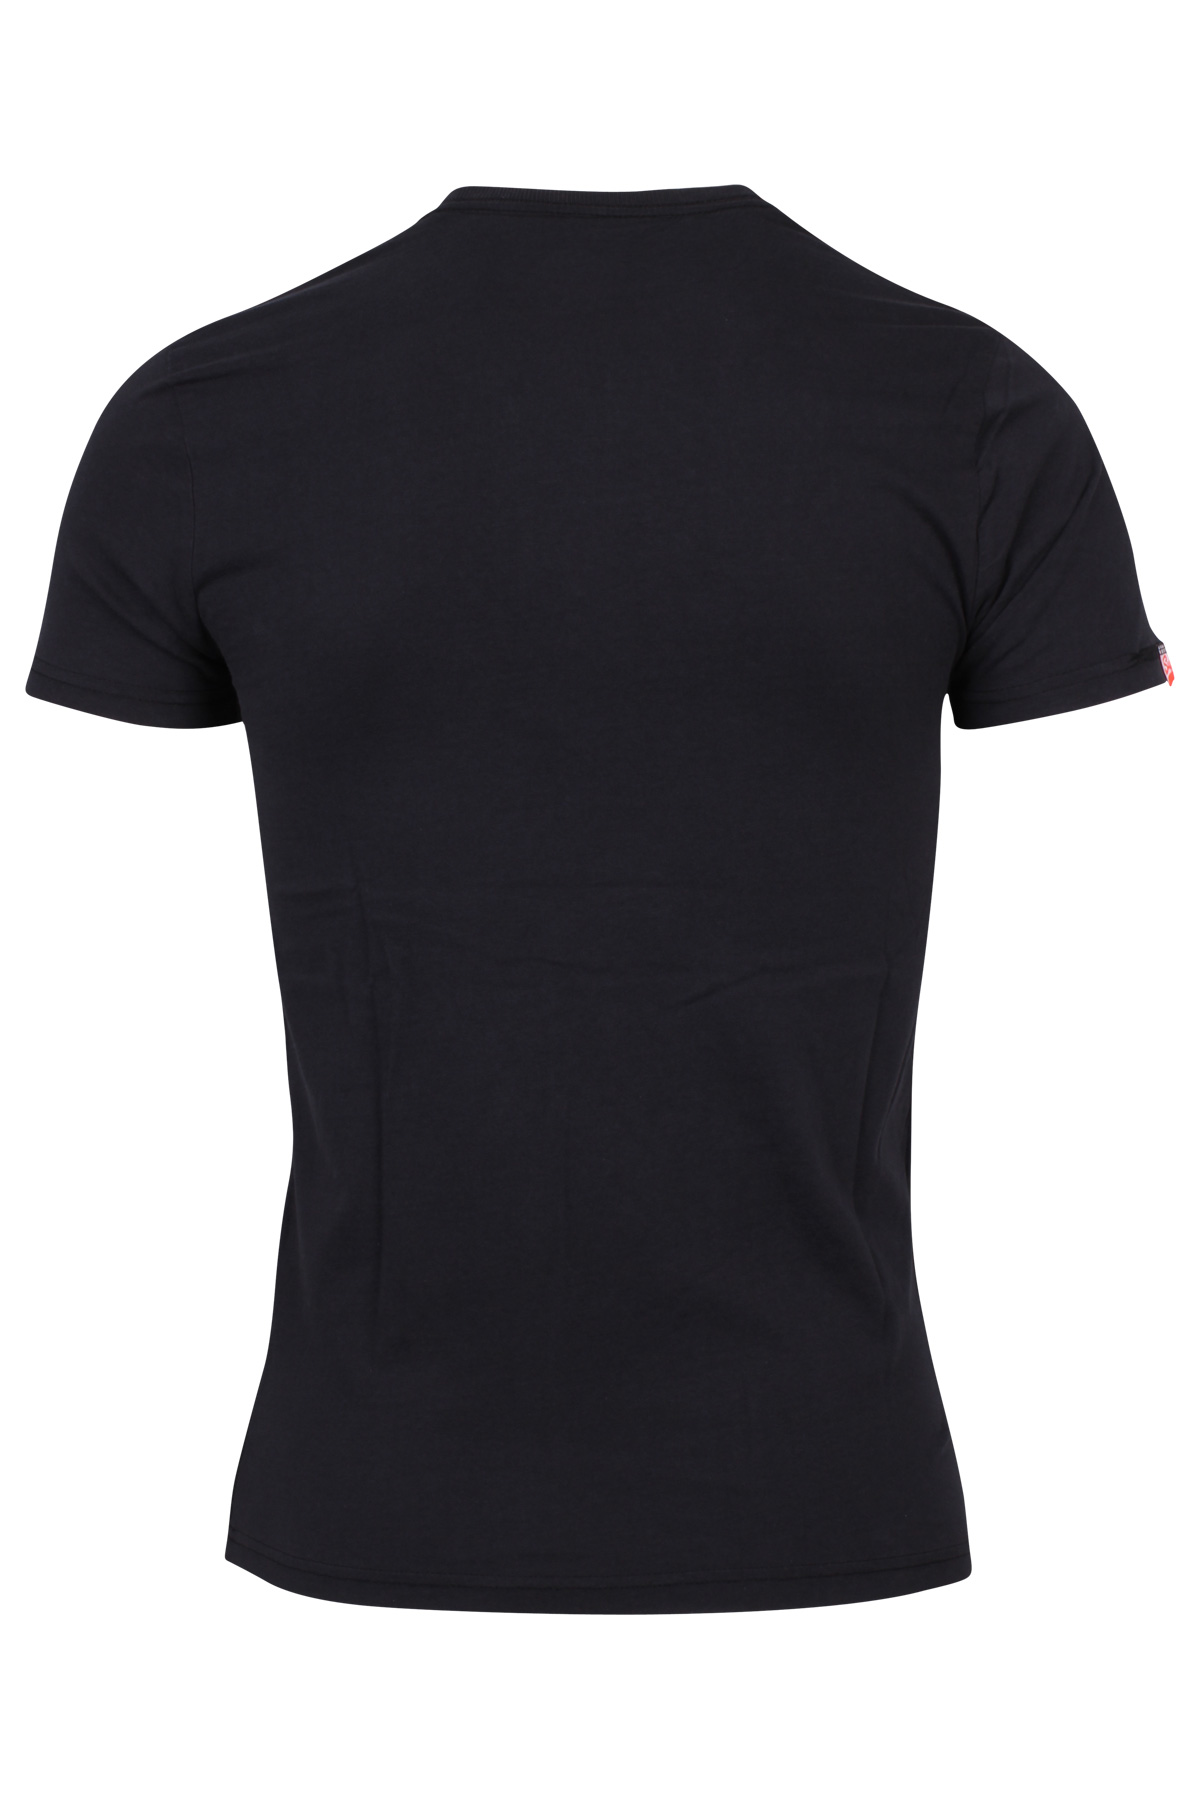 superdry t shirt vintage logoshirt duo entry tee herren shirt uvp 34 95 ebay. Black Bedroom Furniture Sets. Home Design Ideas